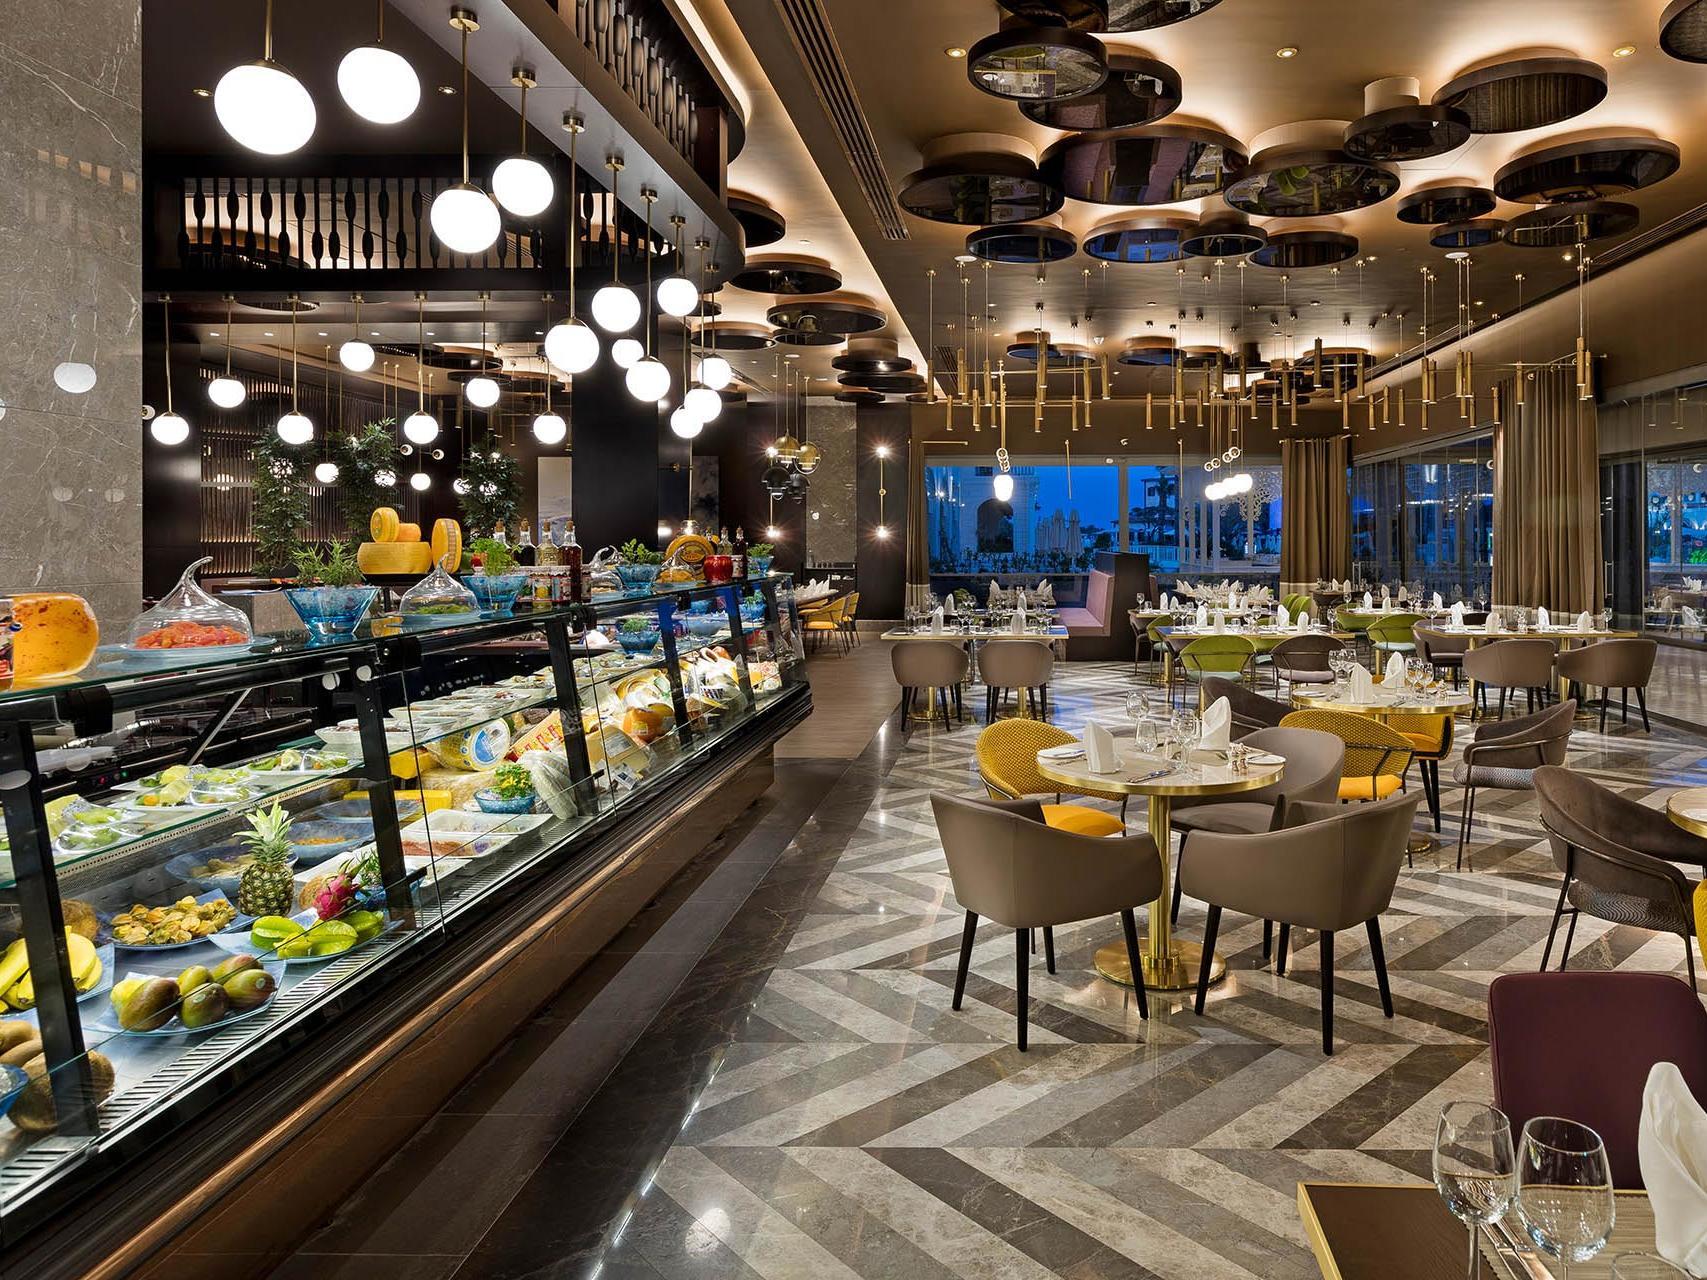 Mardanpalacehotel-Otel-Mermer-Dekorasyon- (14)